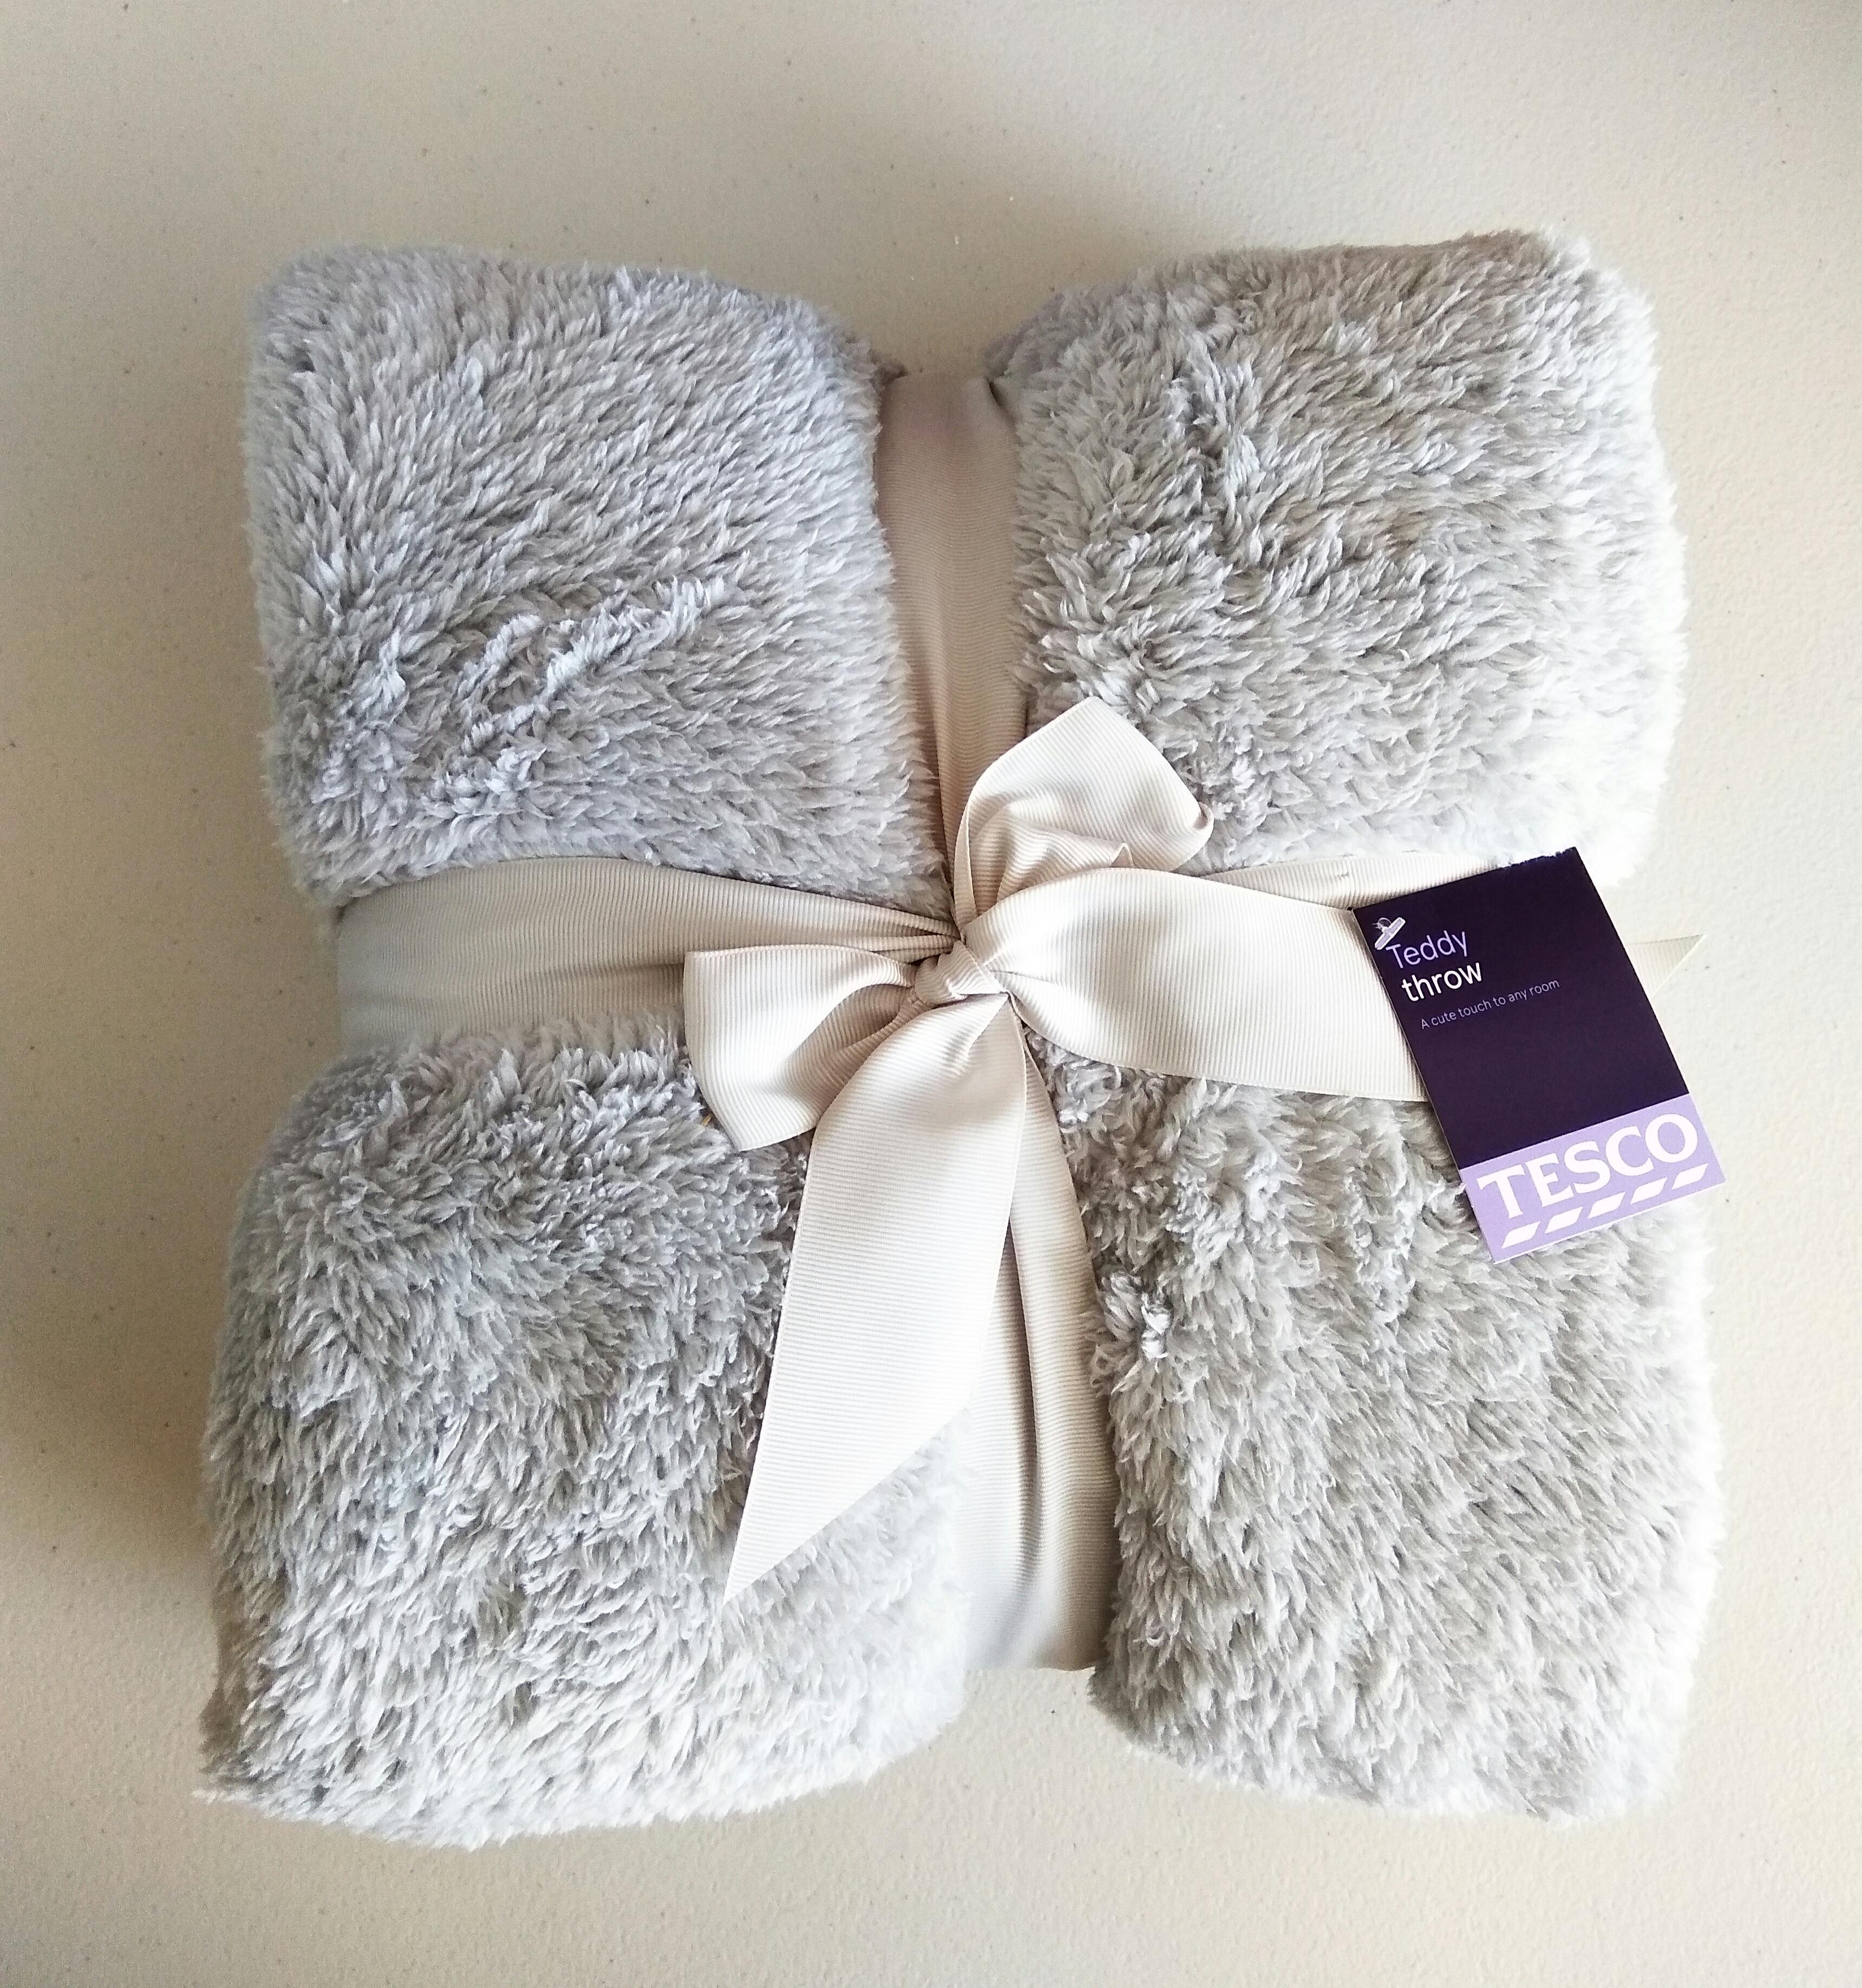 Teddy Throw/Blanket in-store - £1.50 @ Tesco (Old Trafford)